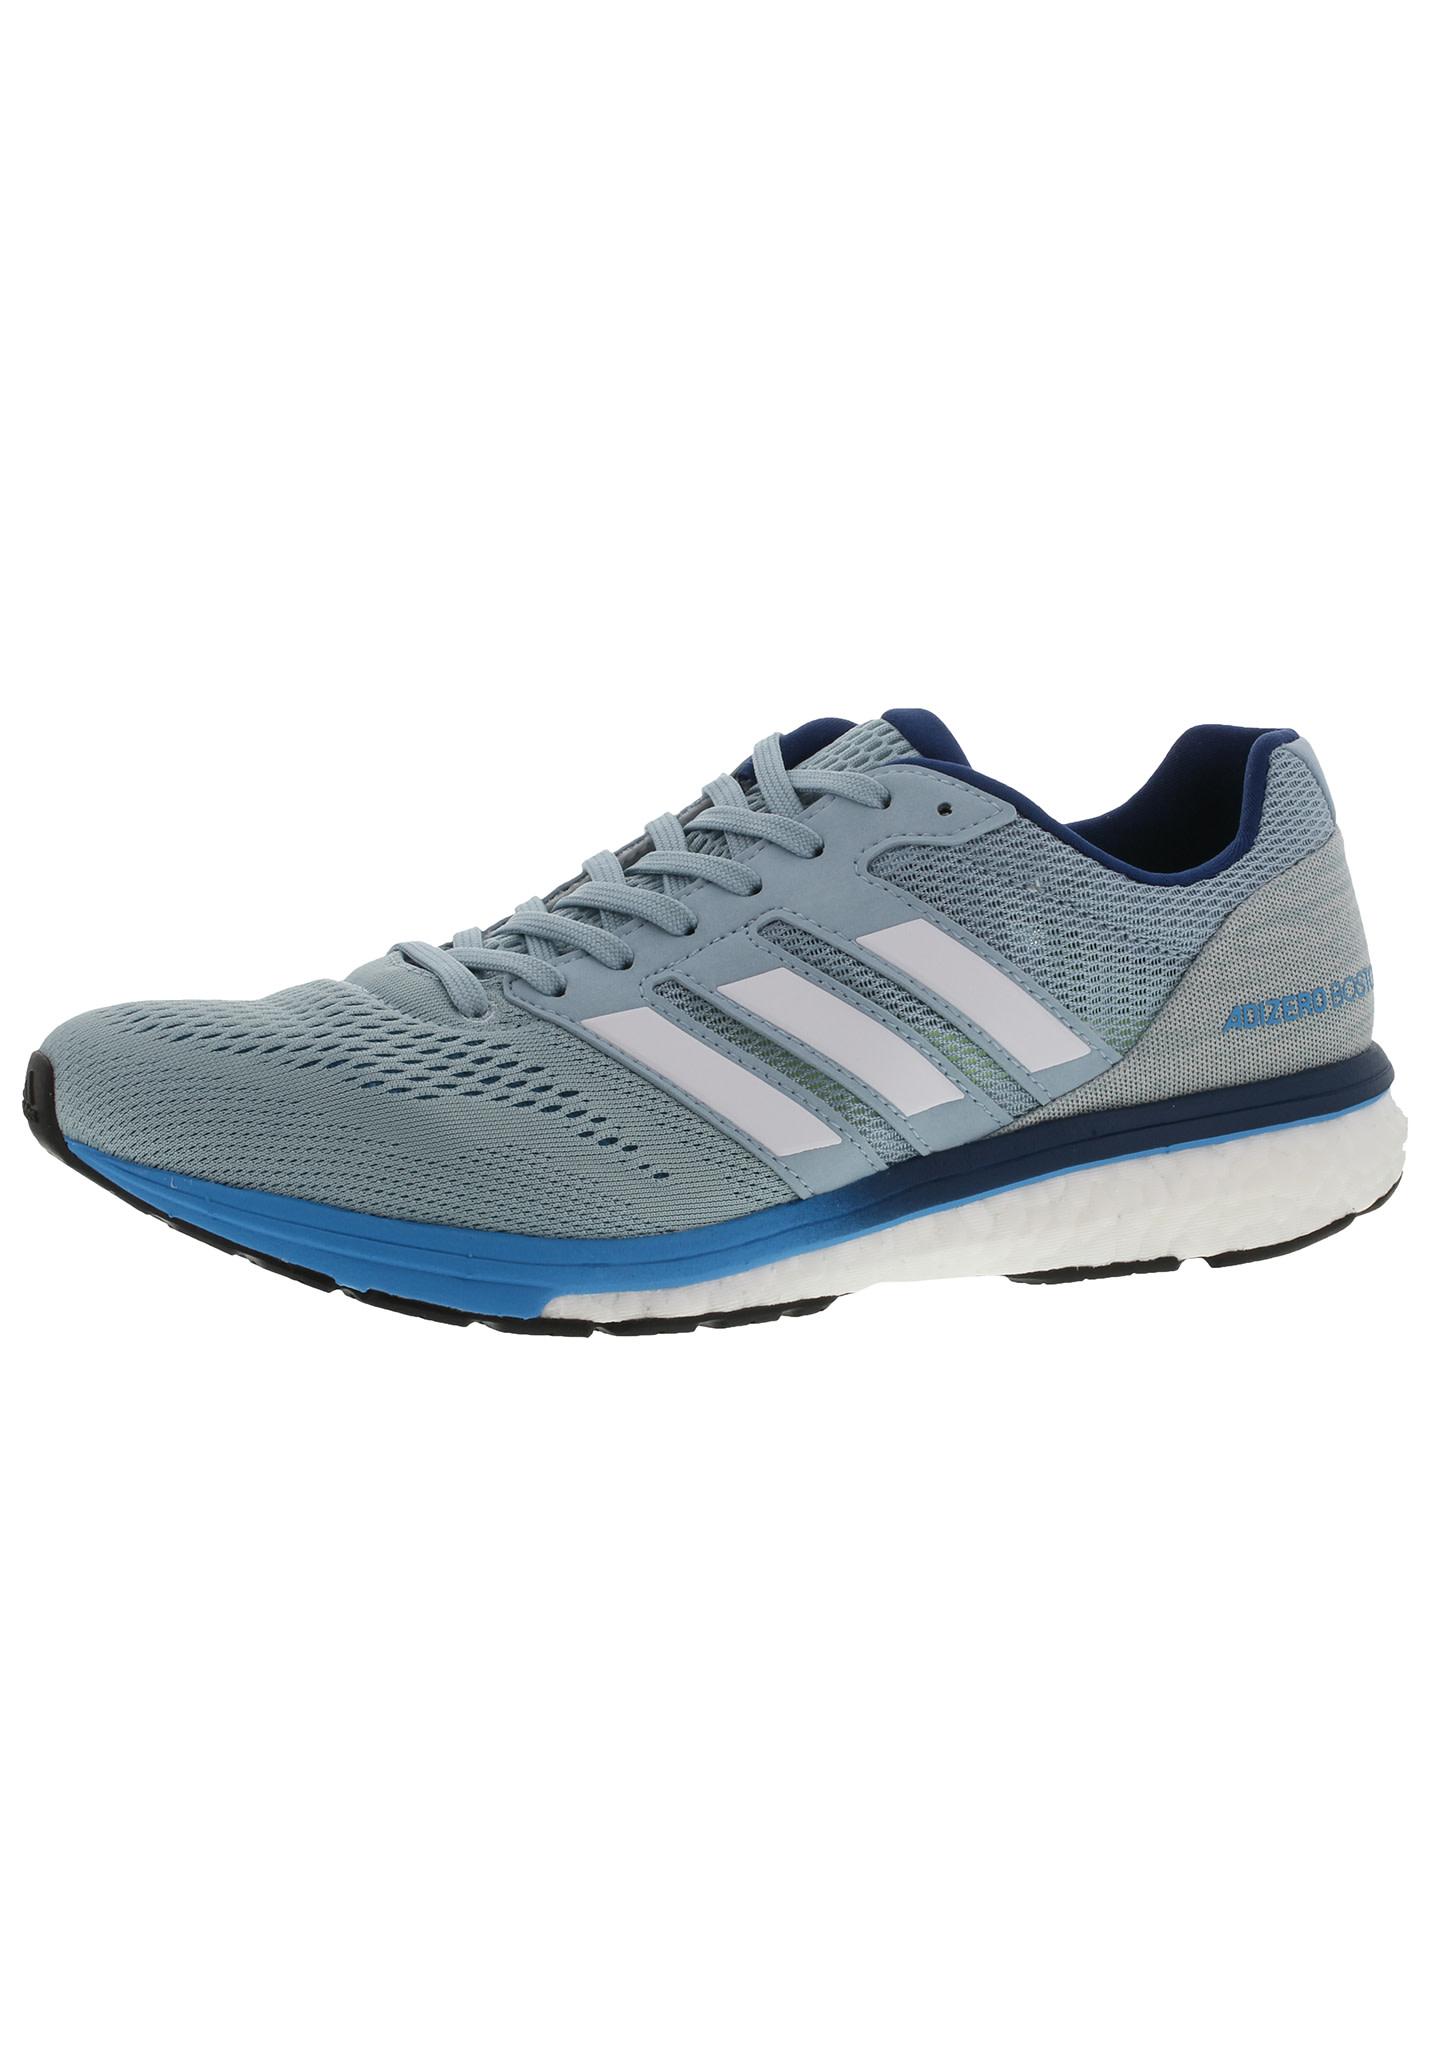 Adidas Bleu Homme Boston Running 7 Pour Adizero Chaussures BQsCtrxhd